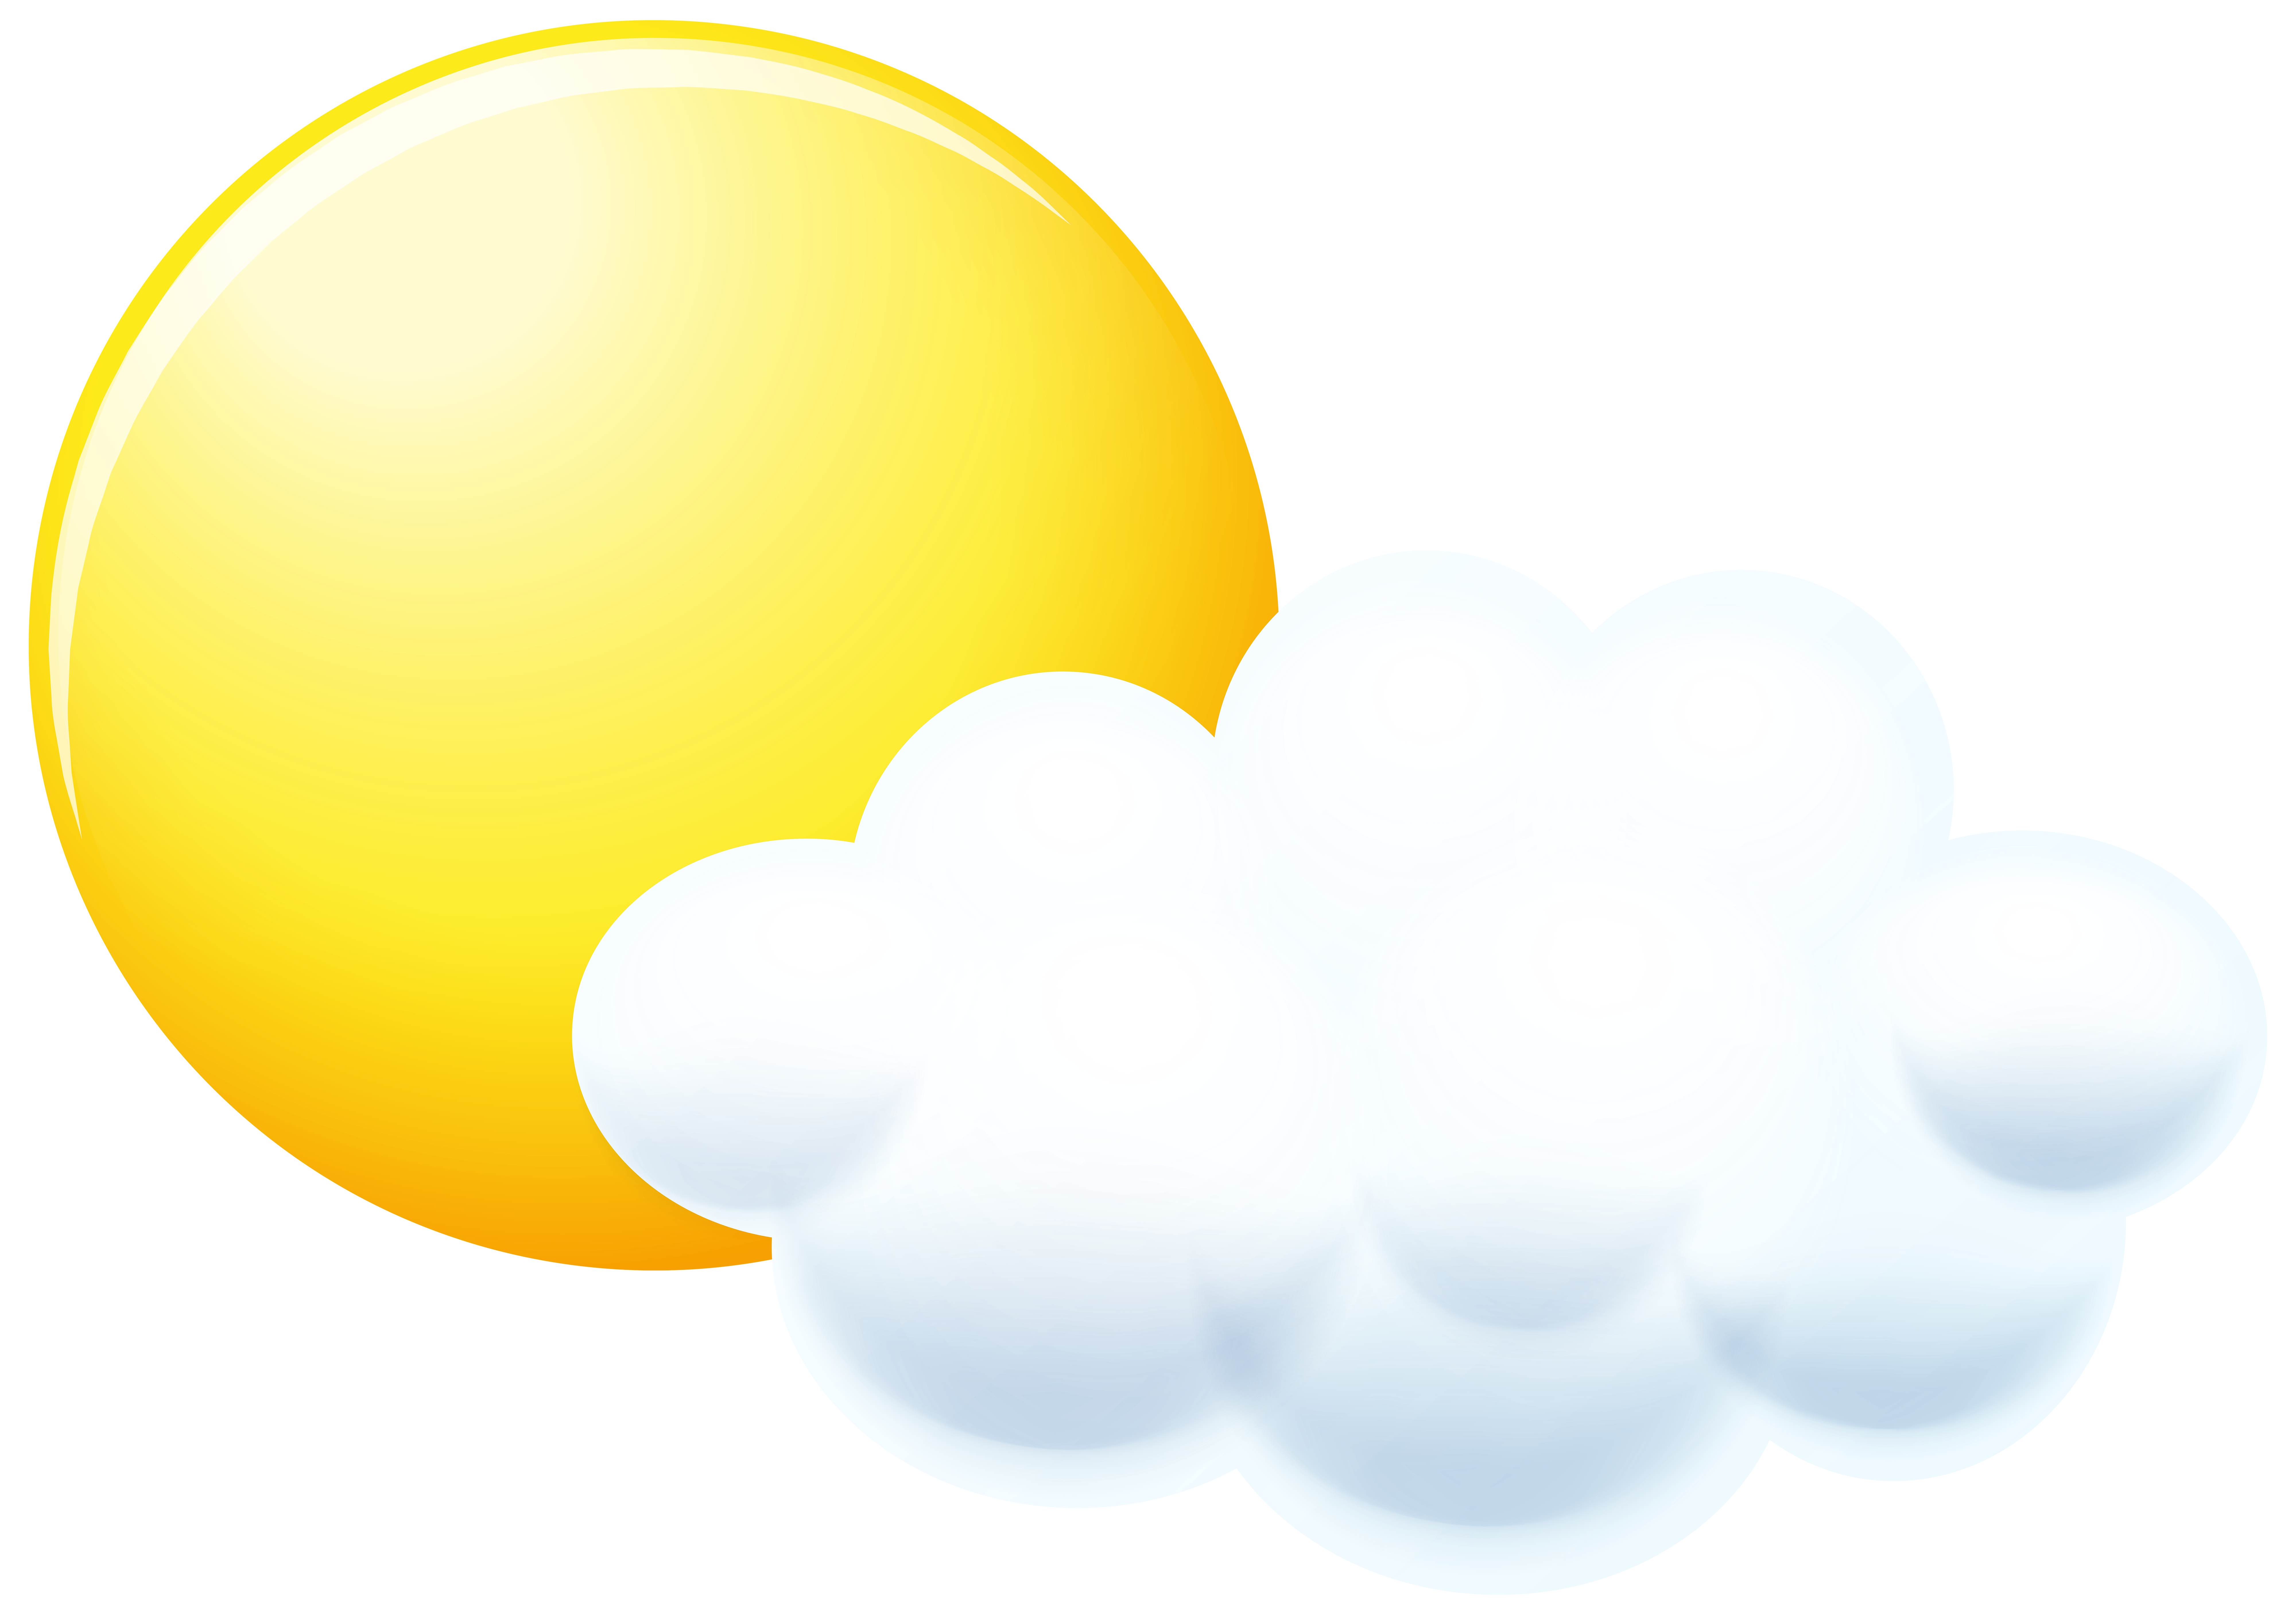 8000x5628 Sun And Cloud Clip Art Png Imageu200b Gallery Yopriceville